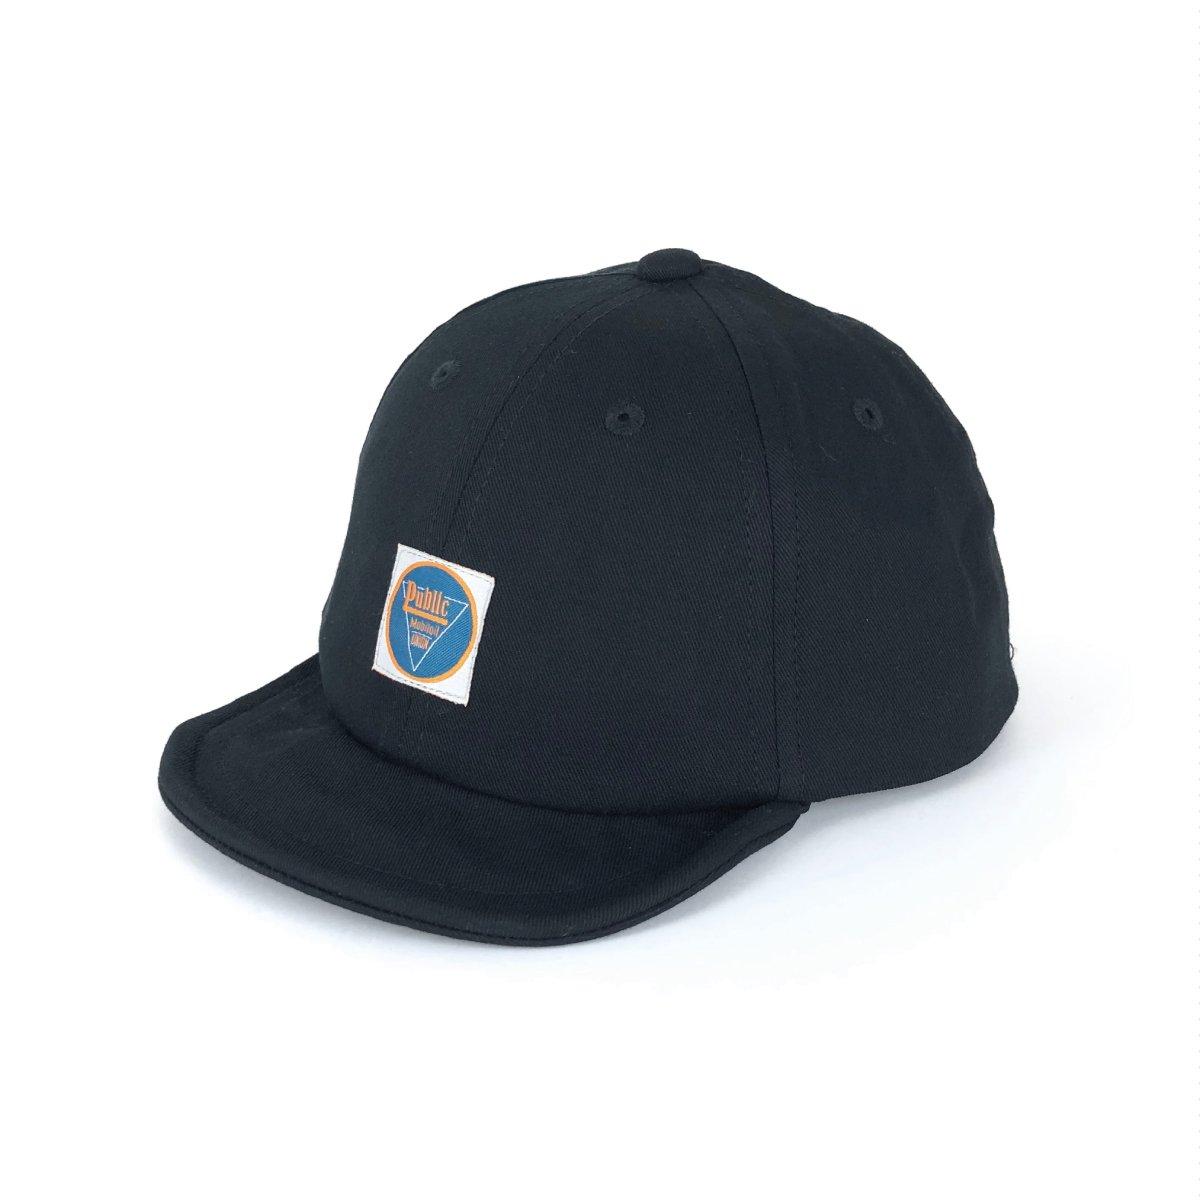 【KIDS】Public Cap 詳細画像4